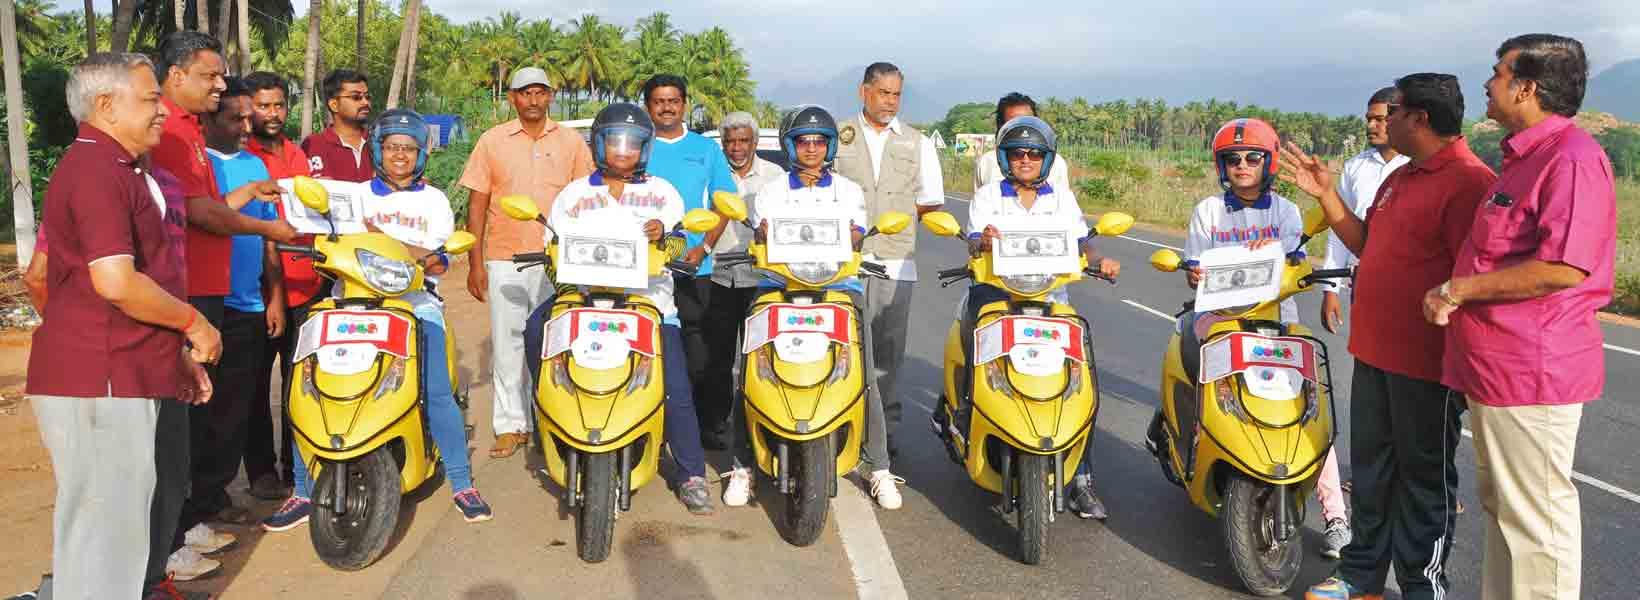 Karur Angels promote Rotary | ROTARY NEWS